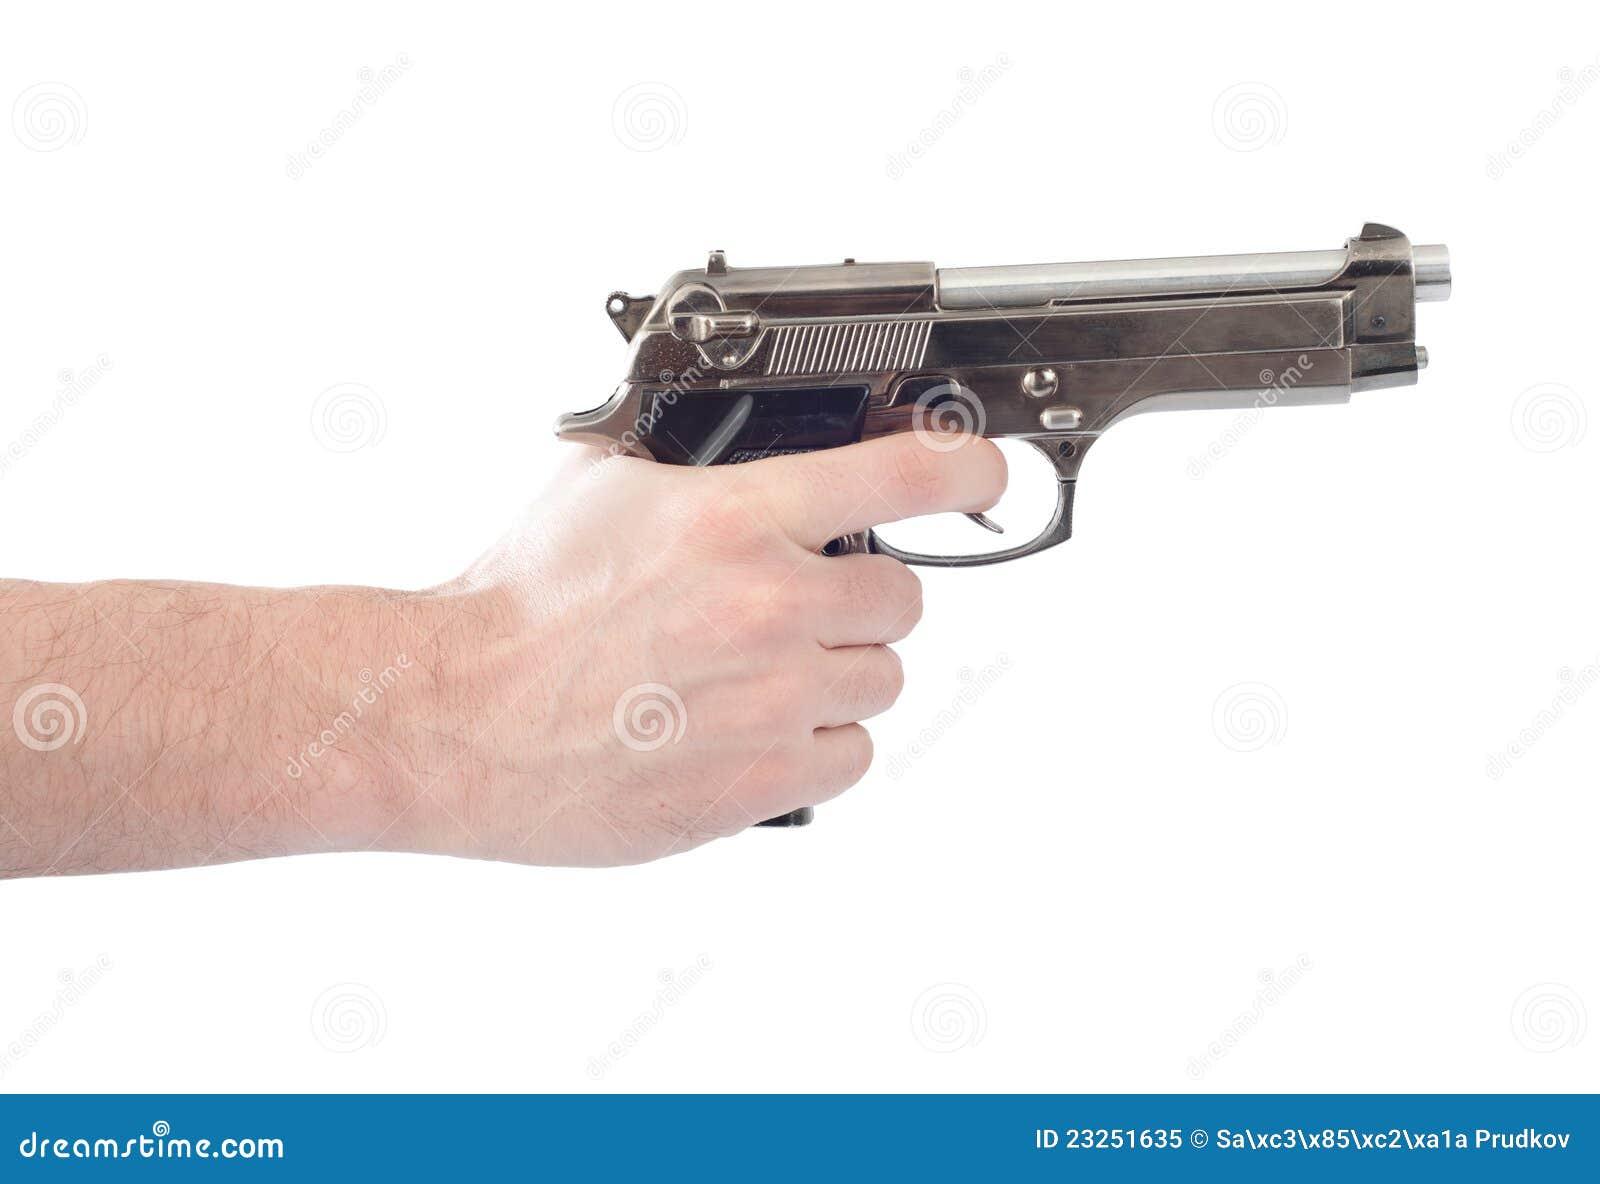 Hand Holding Gun Royalty Free Stock Photo - Image: 23251635